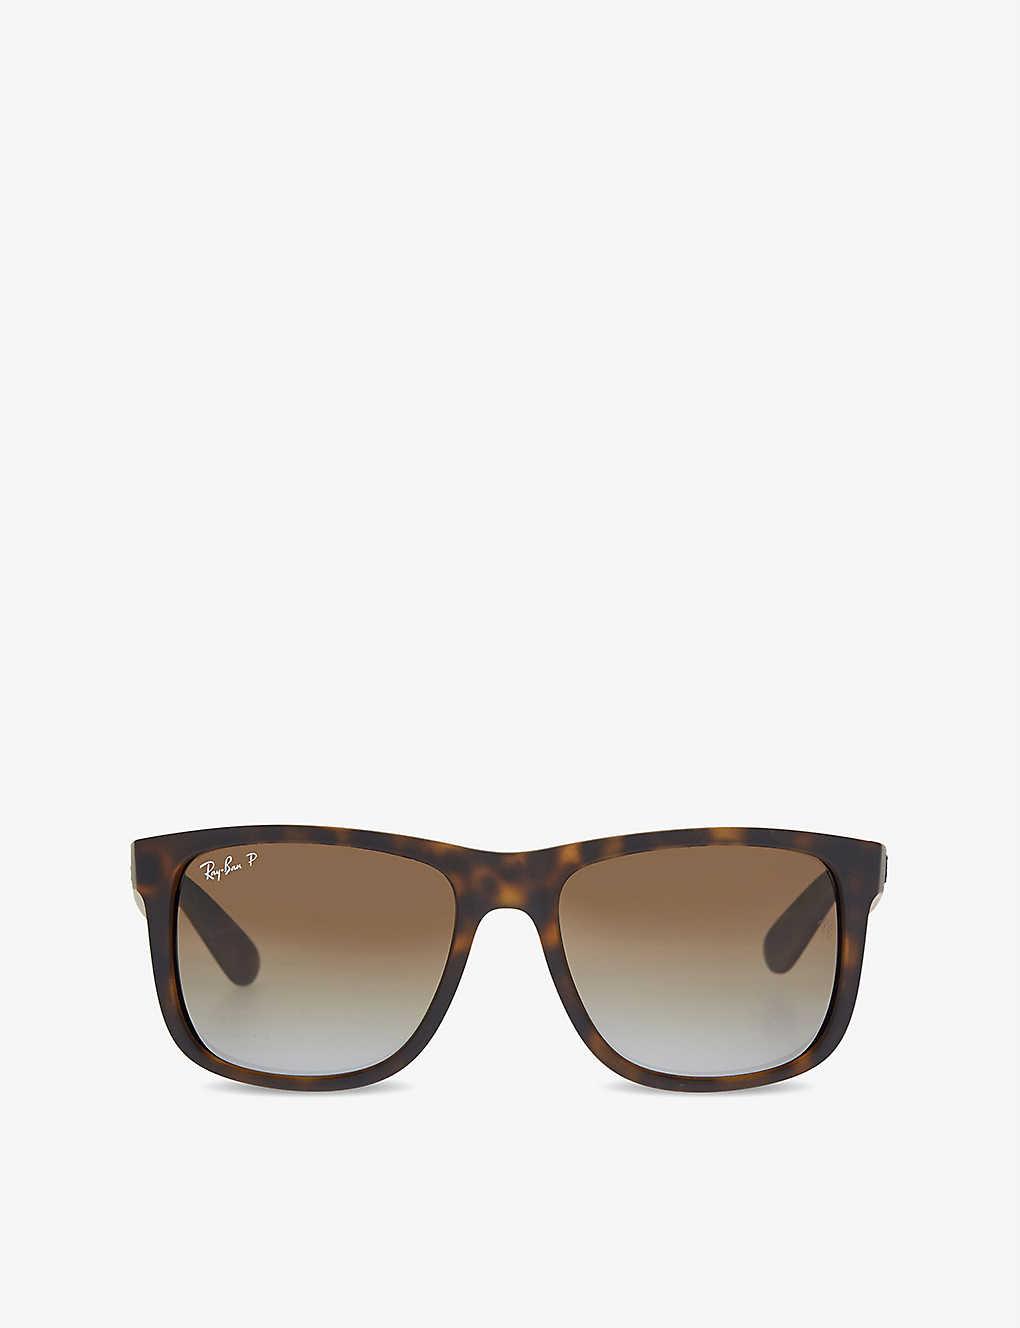 09280663a RAY-BAN - RB4165 tortoise shell rectangle sunglasses | Selfridges.com